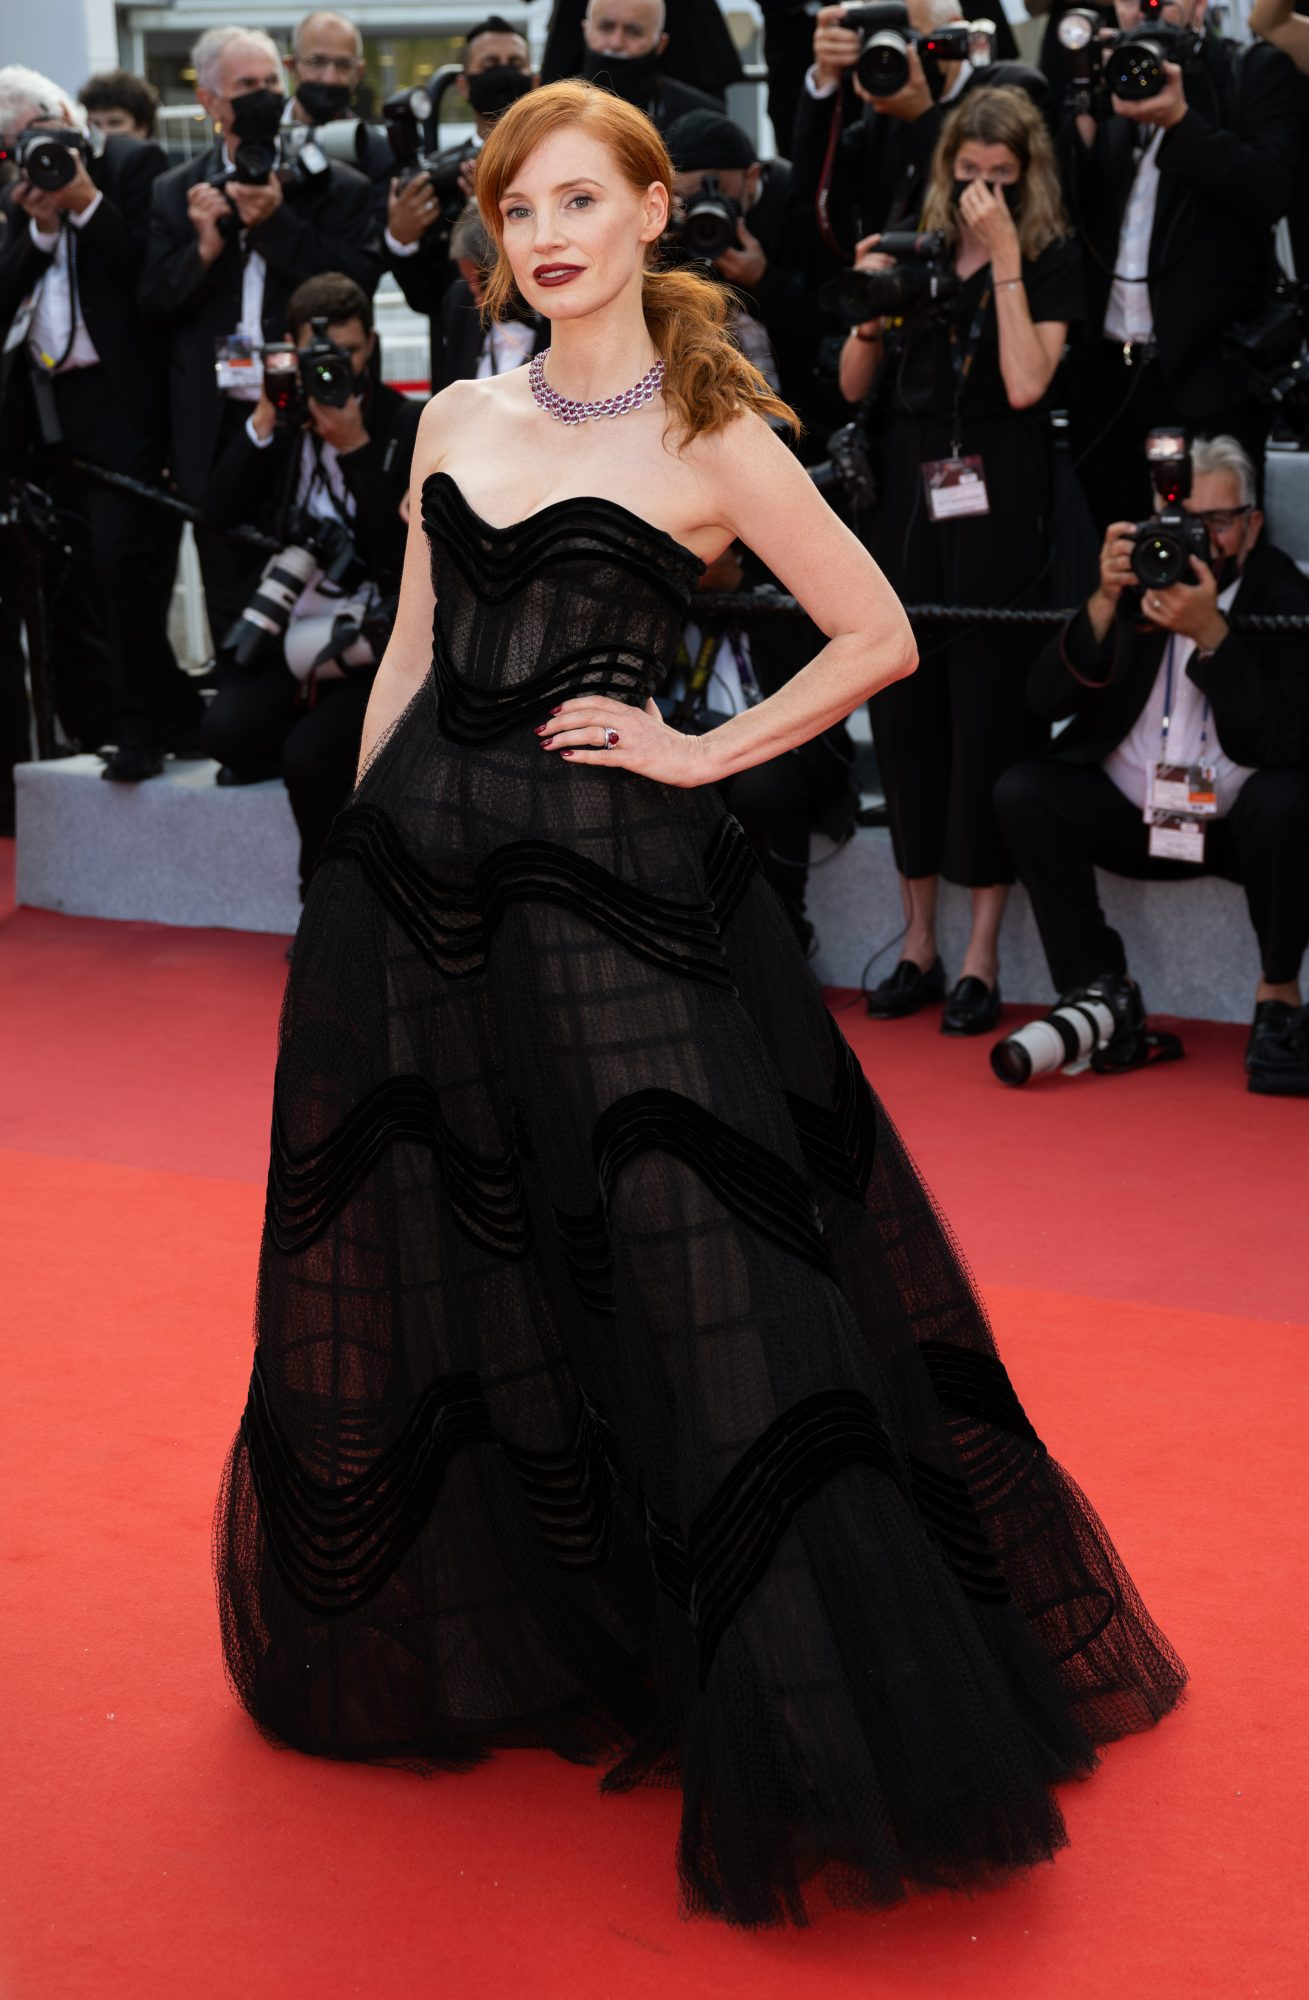 Festival de cine de Cannes alfombra roja, Jessica Chastain